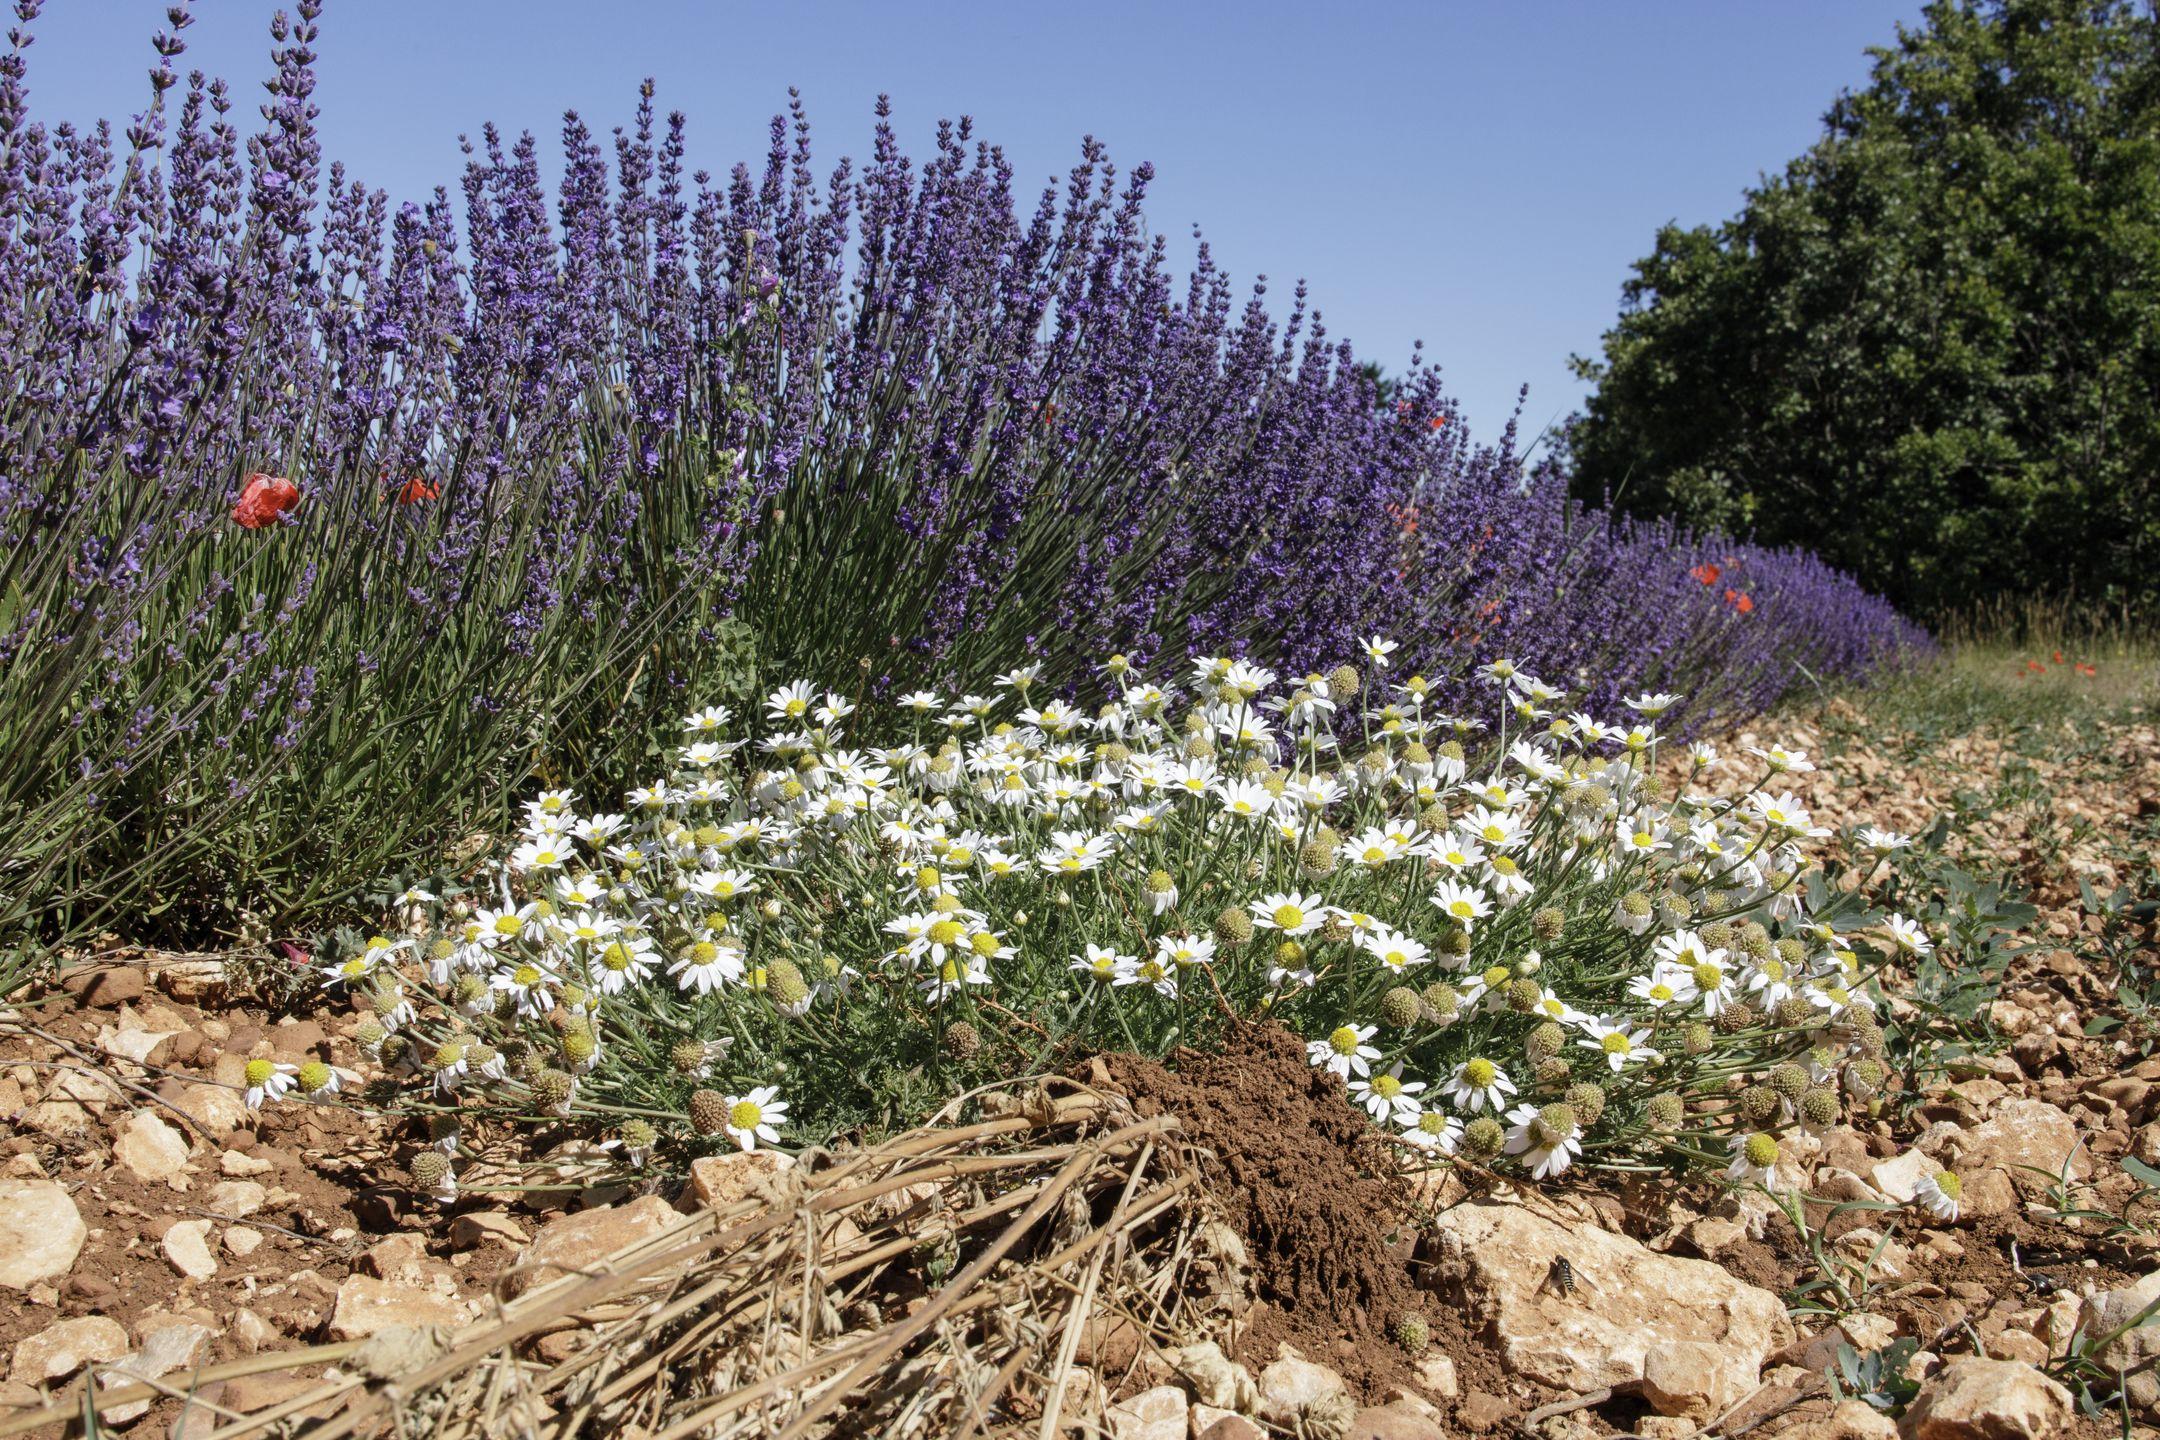 20210630-Provence-10-32-35-024